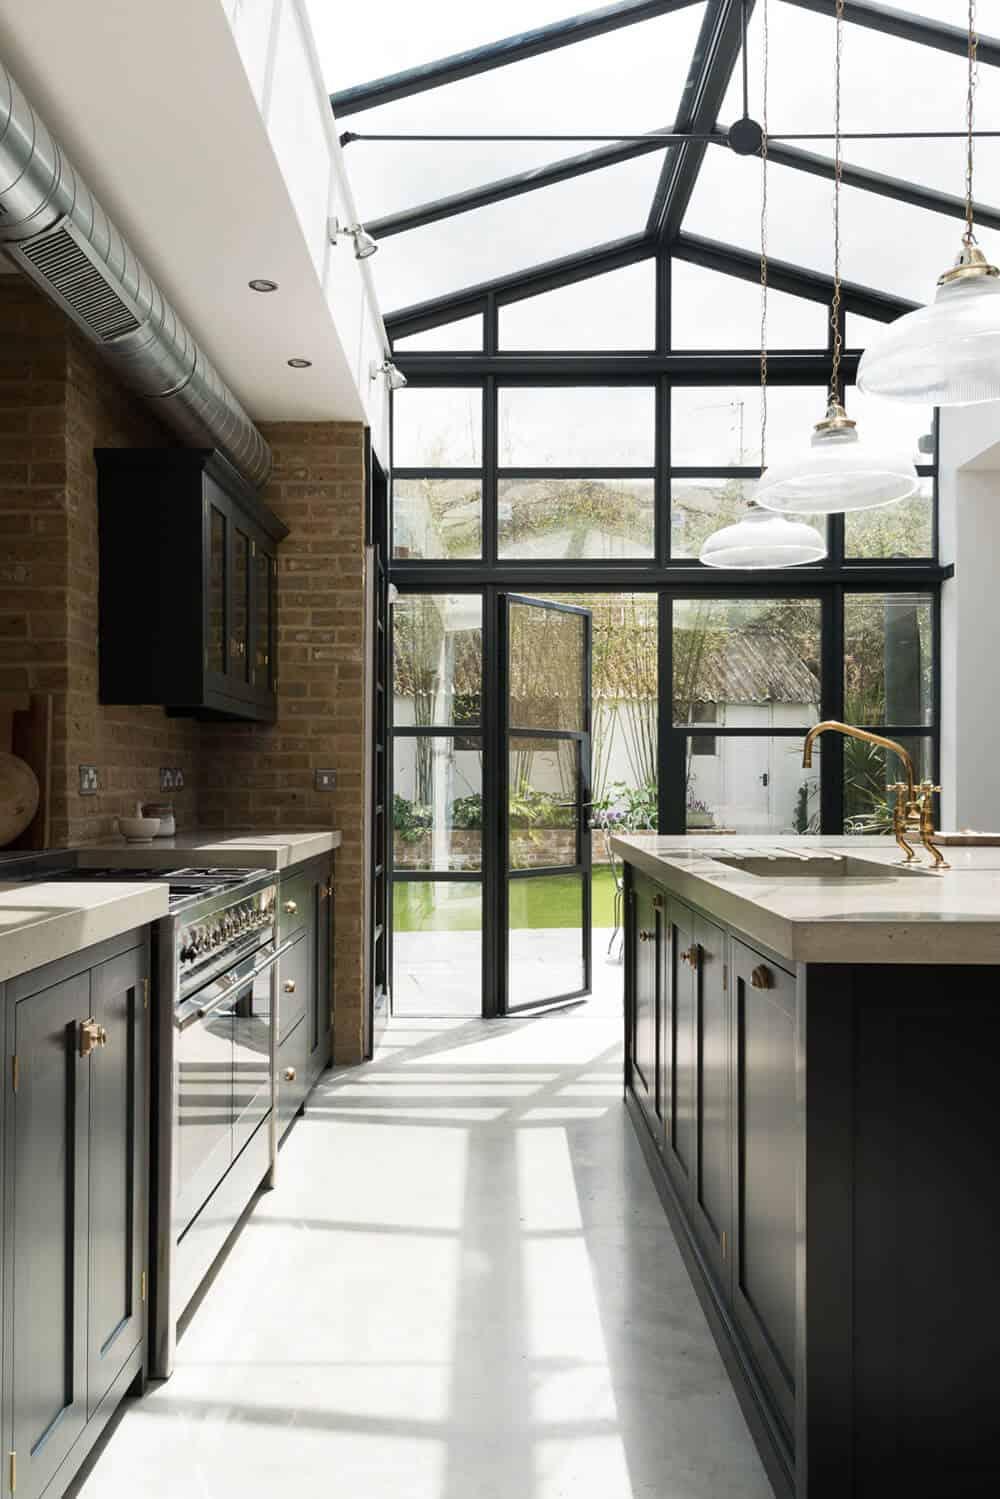 devol-kitchens__english-shaker_traditional-design_kitchen_simple_tudor_country_designer-spotlight_emily-henderson_inspiration_17